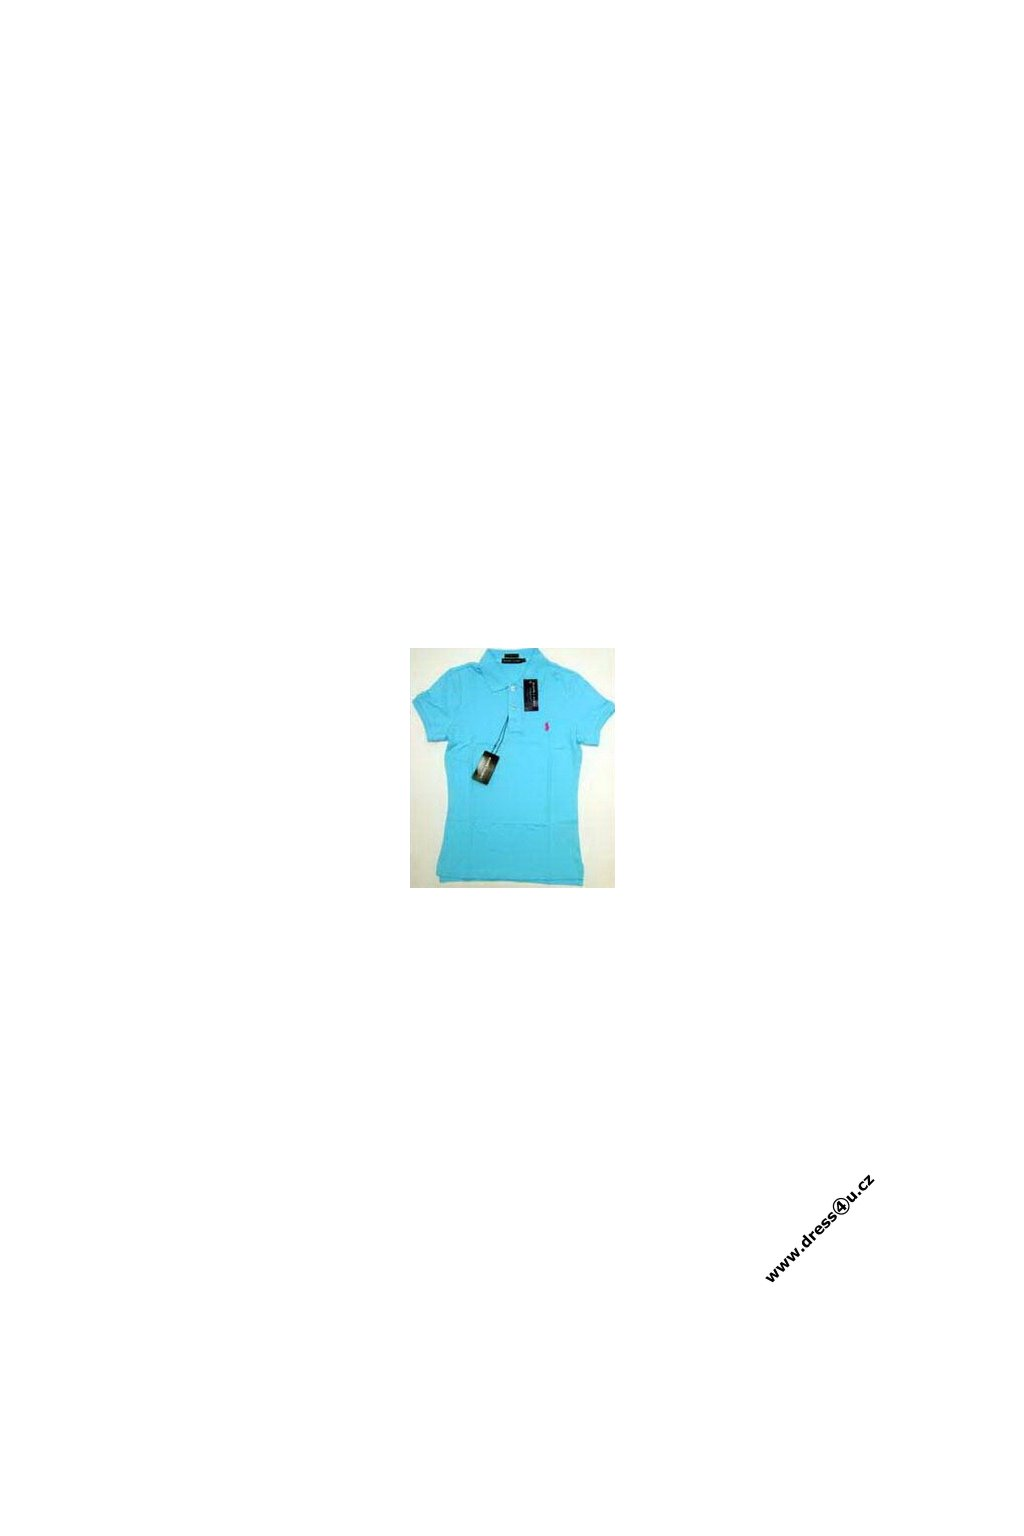 Ralph Lauren dámské polo triko tyrkysové